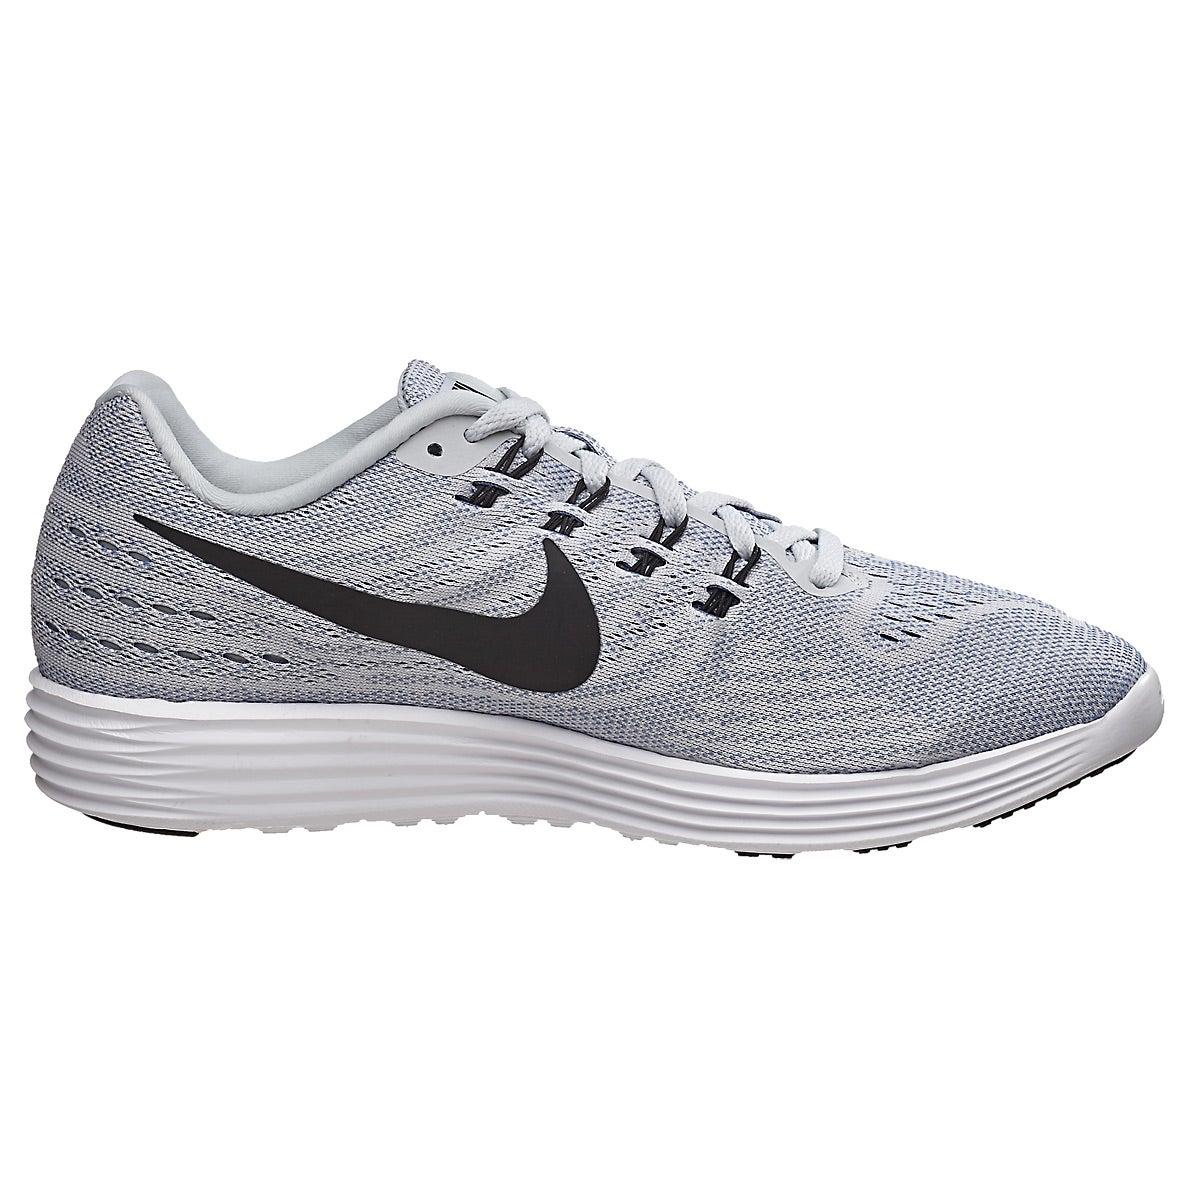 super popular 0bc7c 40fcf Nike LunarTempo 2 Men s Shoes Platinum Black Ocean 360° View   Running  Warehouse.